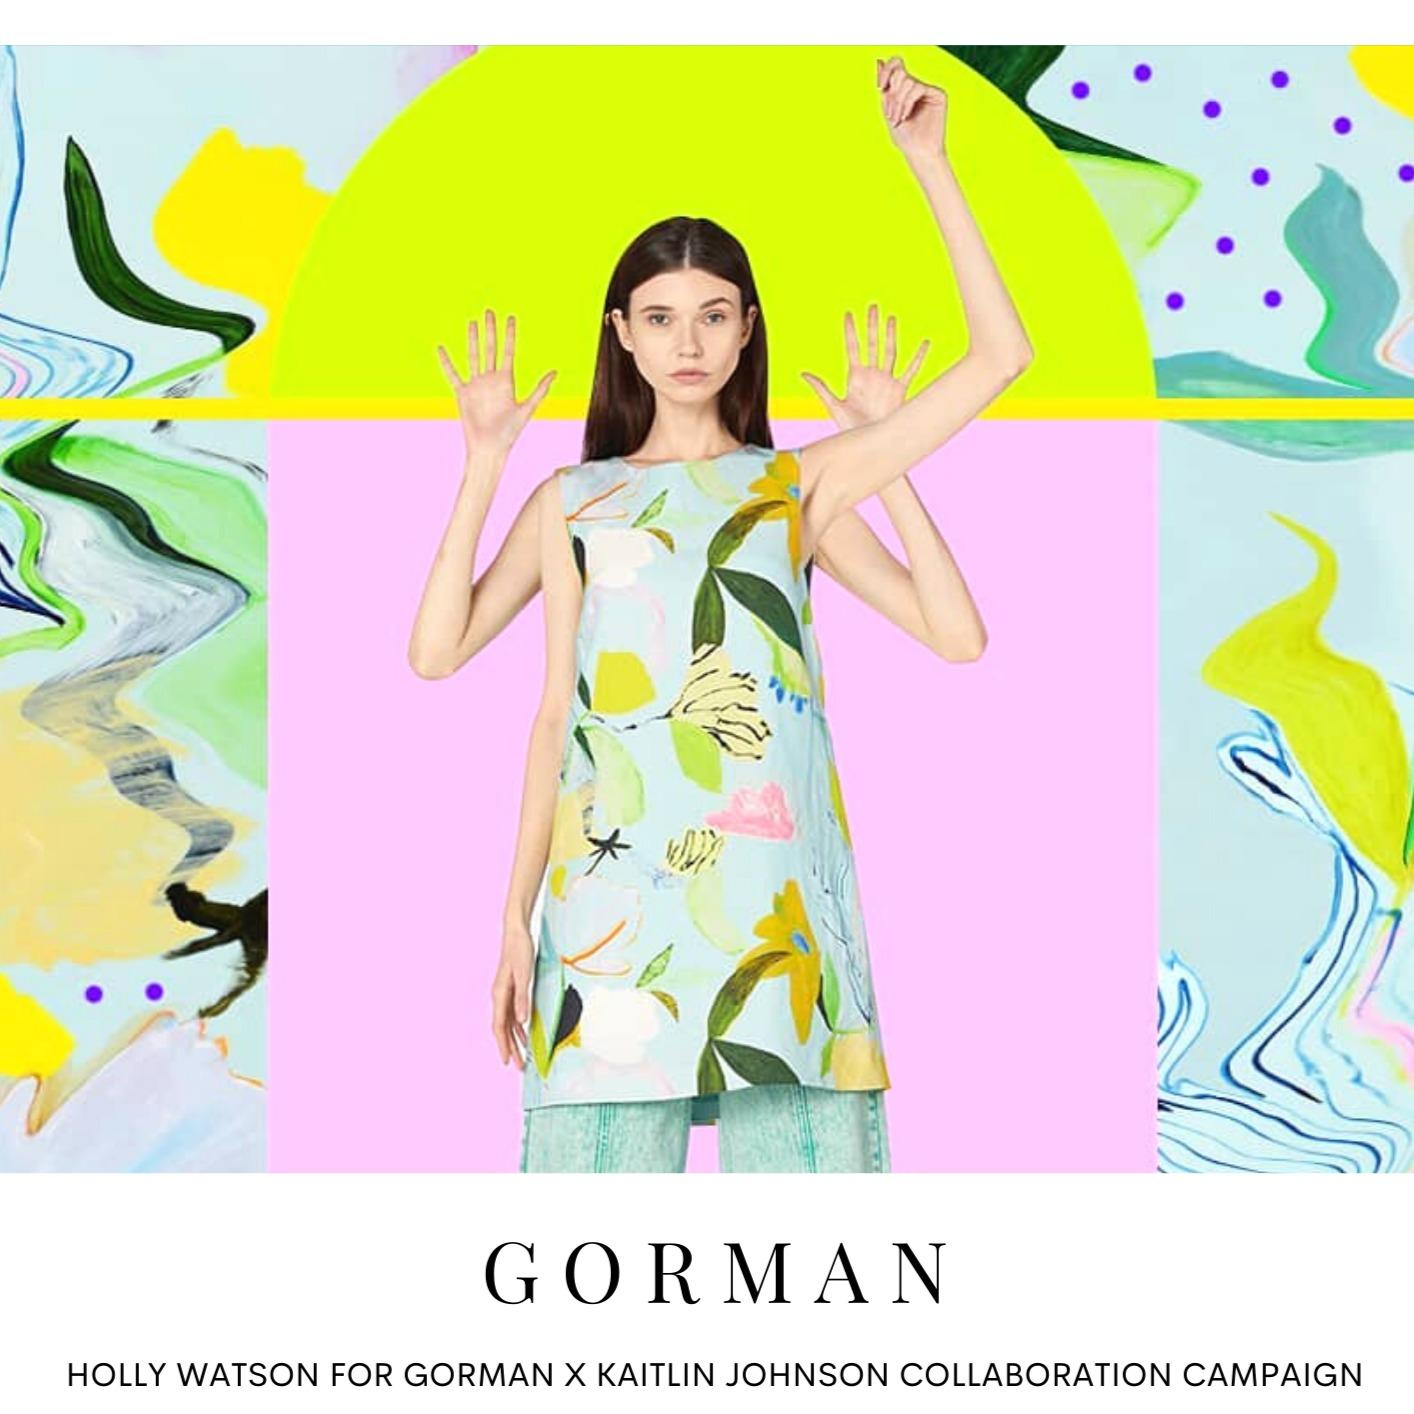 HOLLY WATSON: GORMAN X KAITLIN JOHNSON COLLABORATION CAMPAIGN | The Models blog